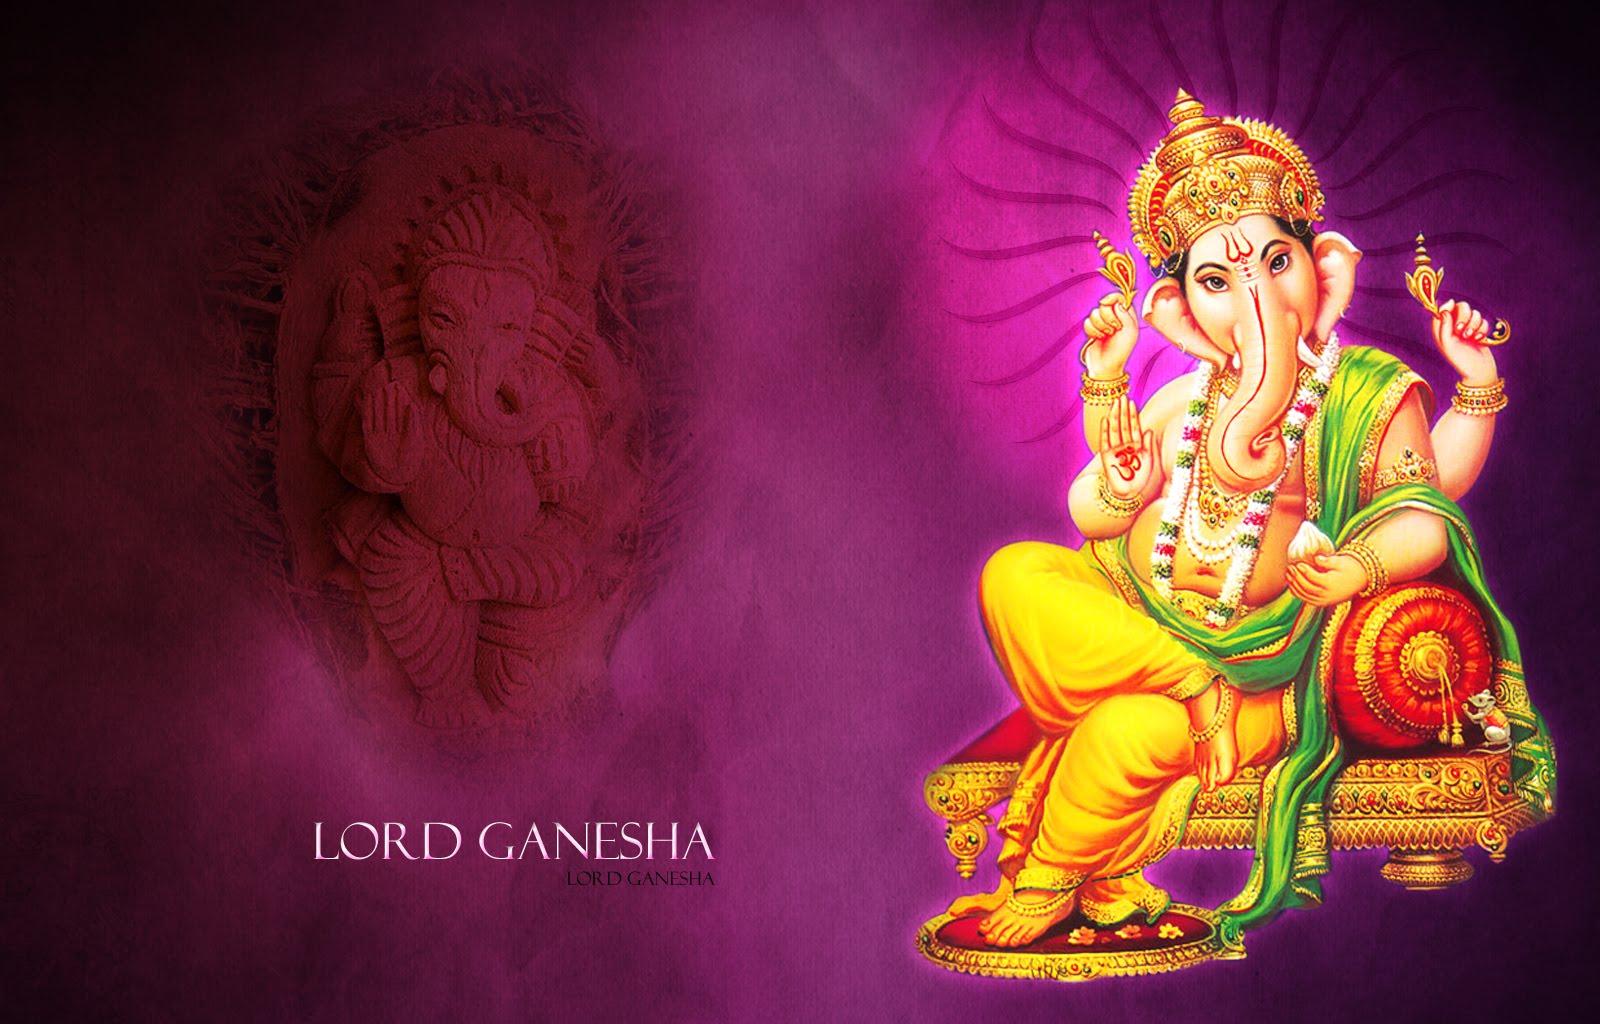 Ganesh Chaturthi Wallpapers Royal Pic World